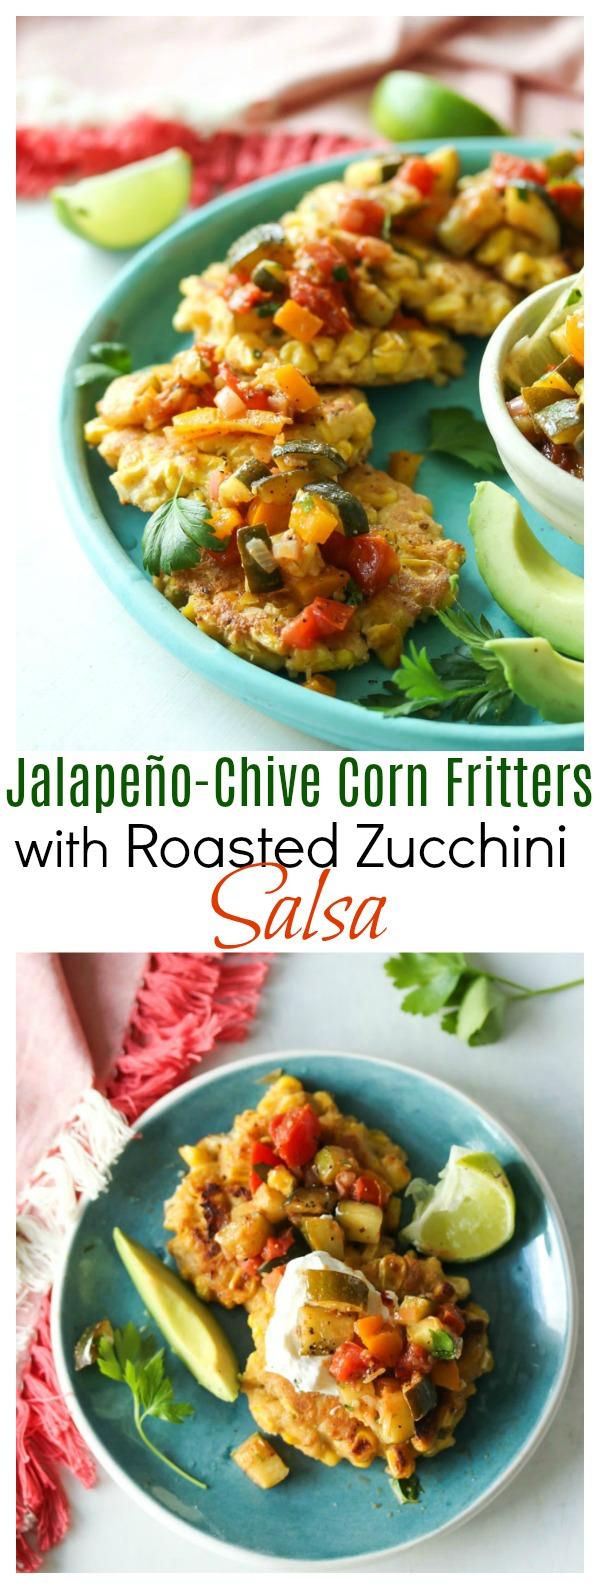 Jalapeno-Chive Corn Fritters with Roasted Zucchini Salsa   dishingouthealth.com